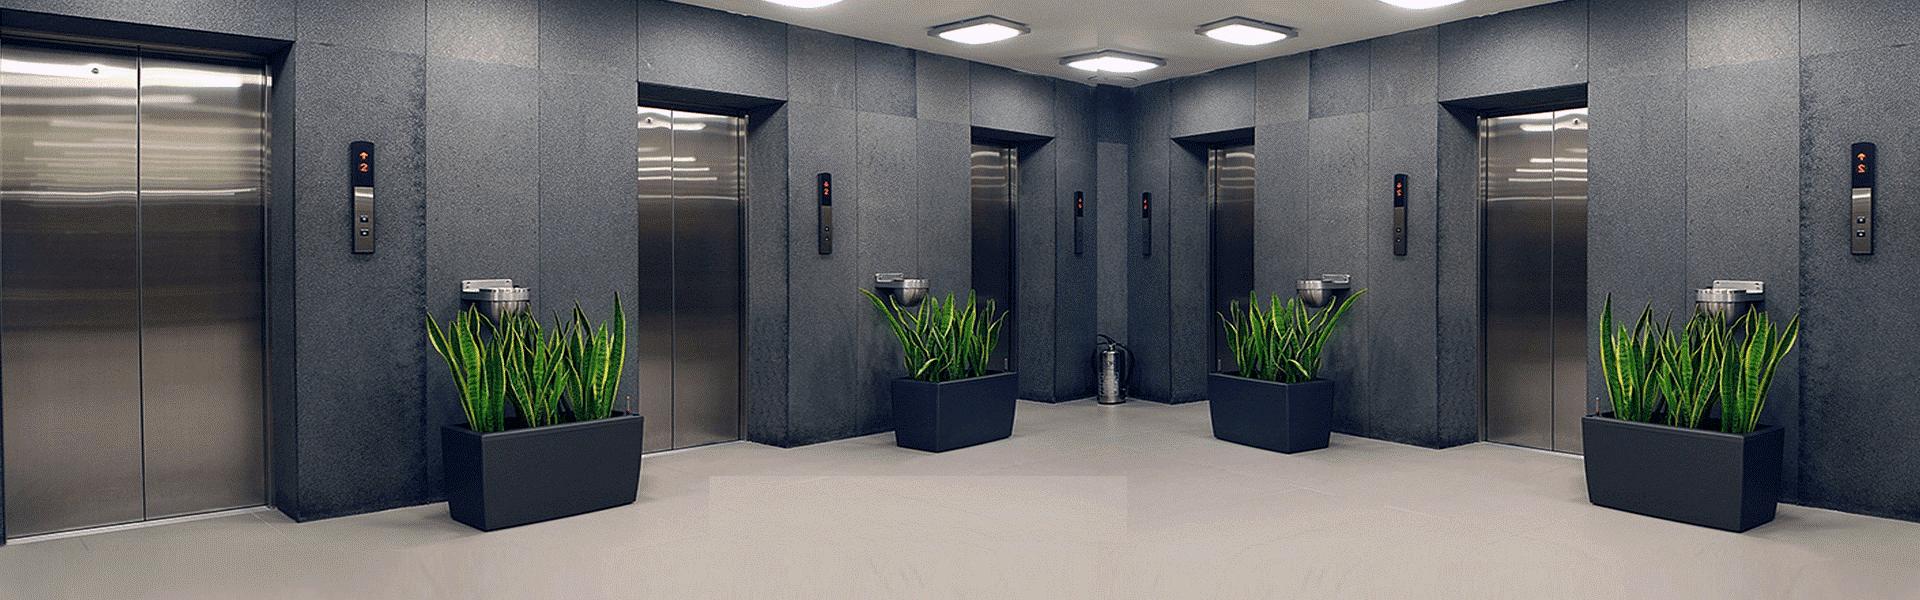 برچسب انواع آسانسور,انواع آسانسور کششی,انواع آسانسورها